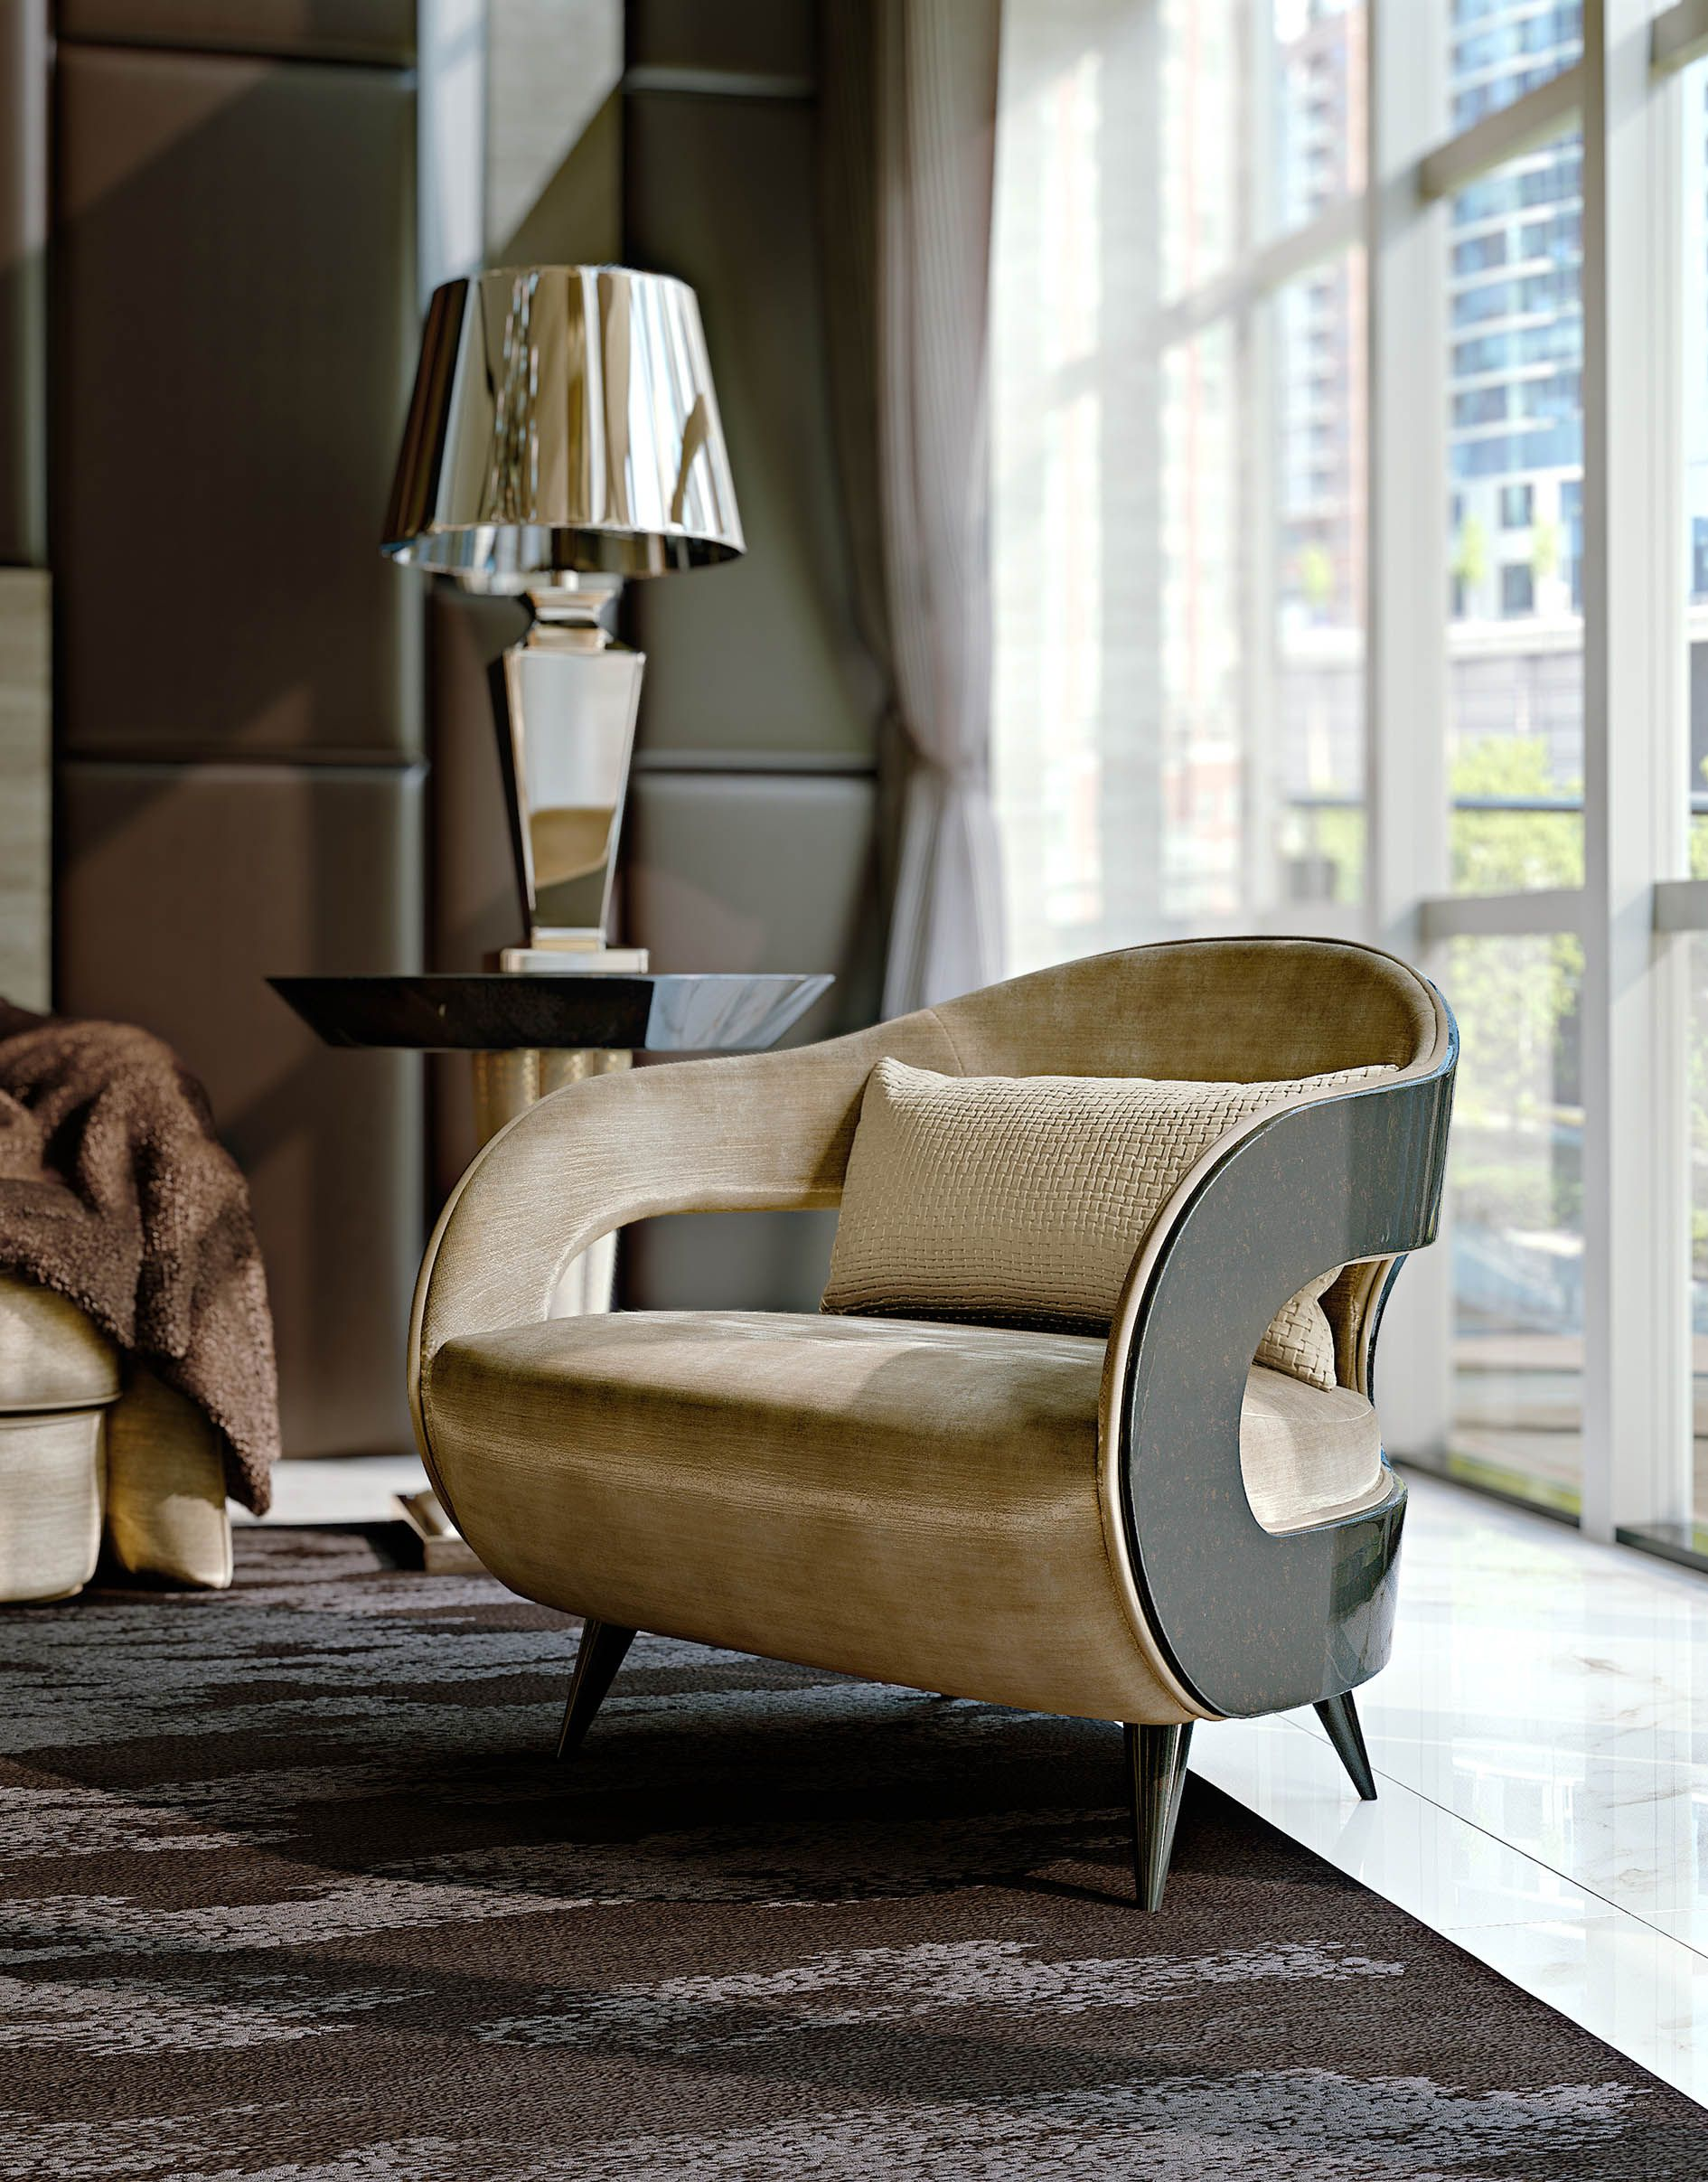 Stardust collection www turri it italian luxury design armchair sofa furniture deco furniture